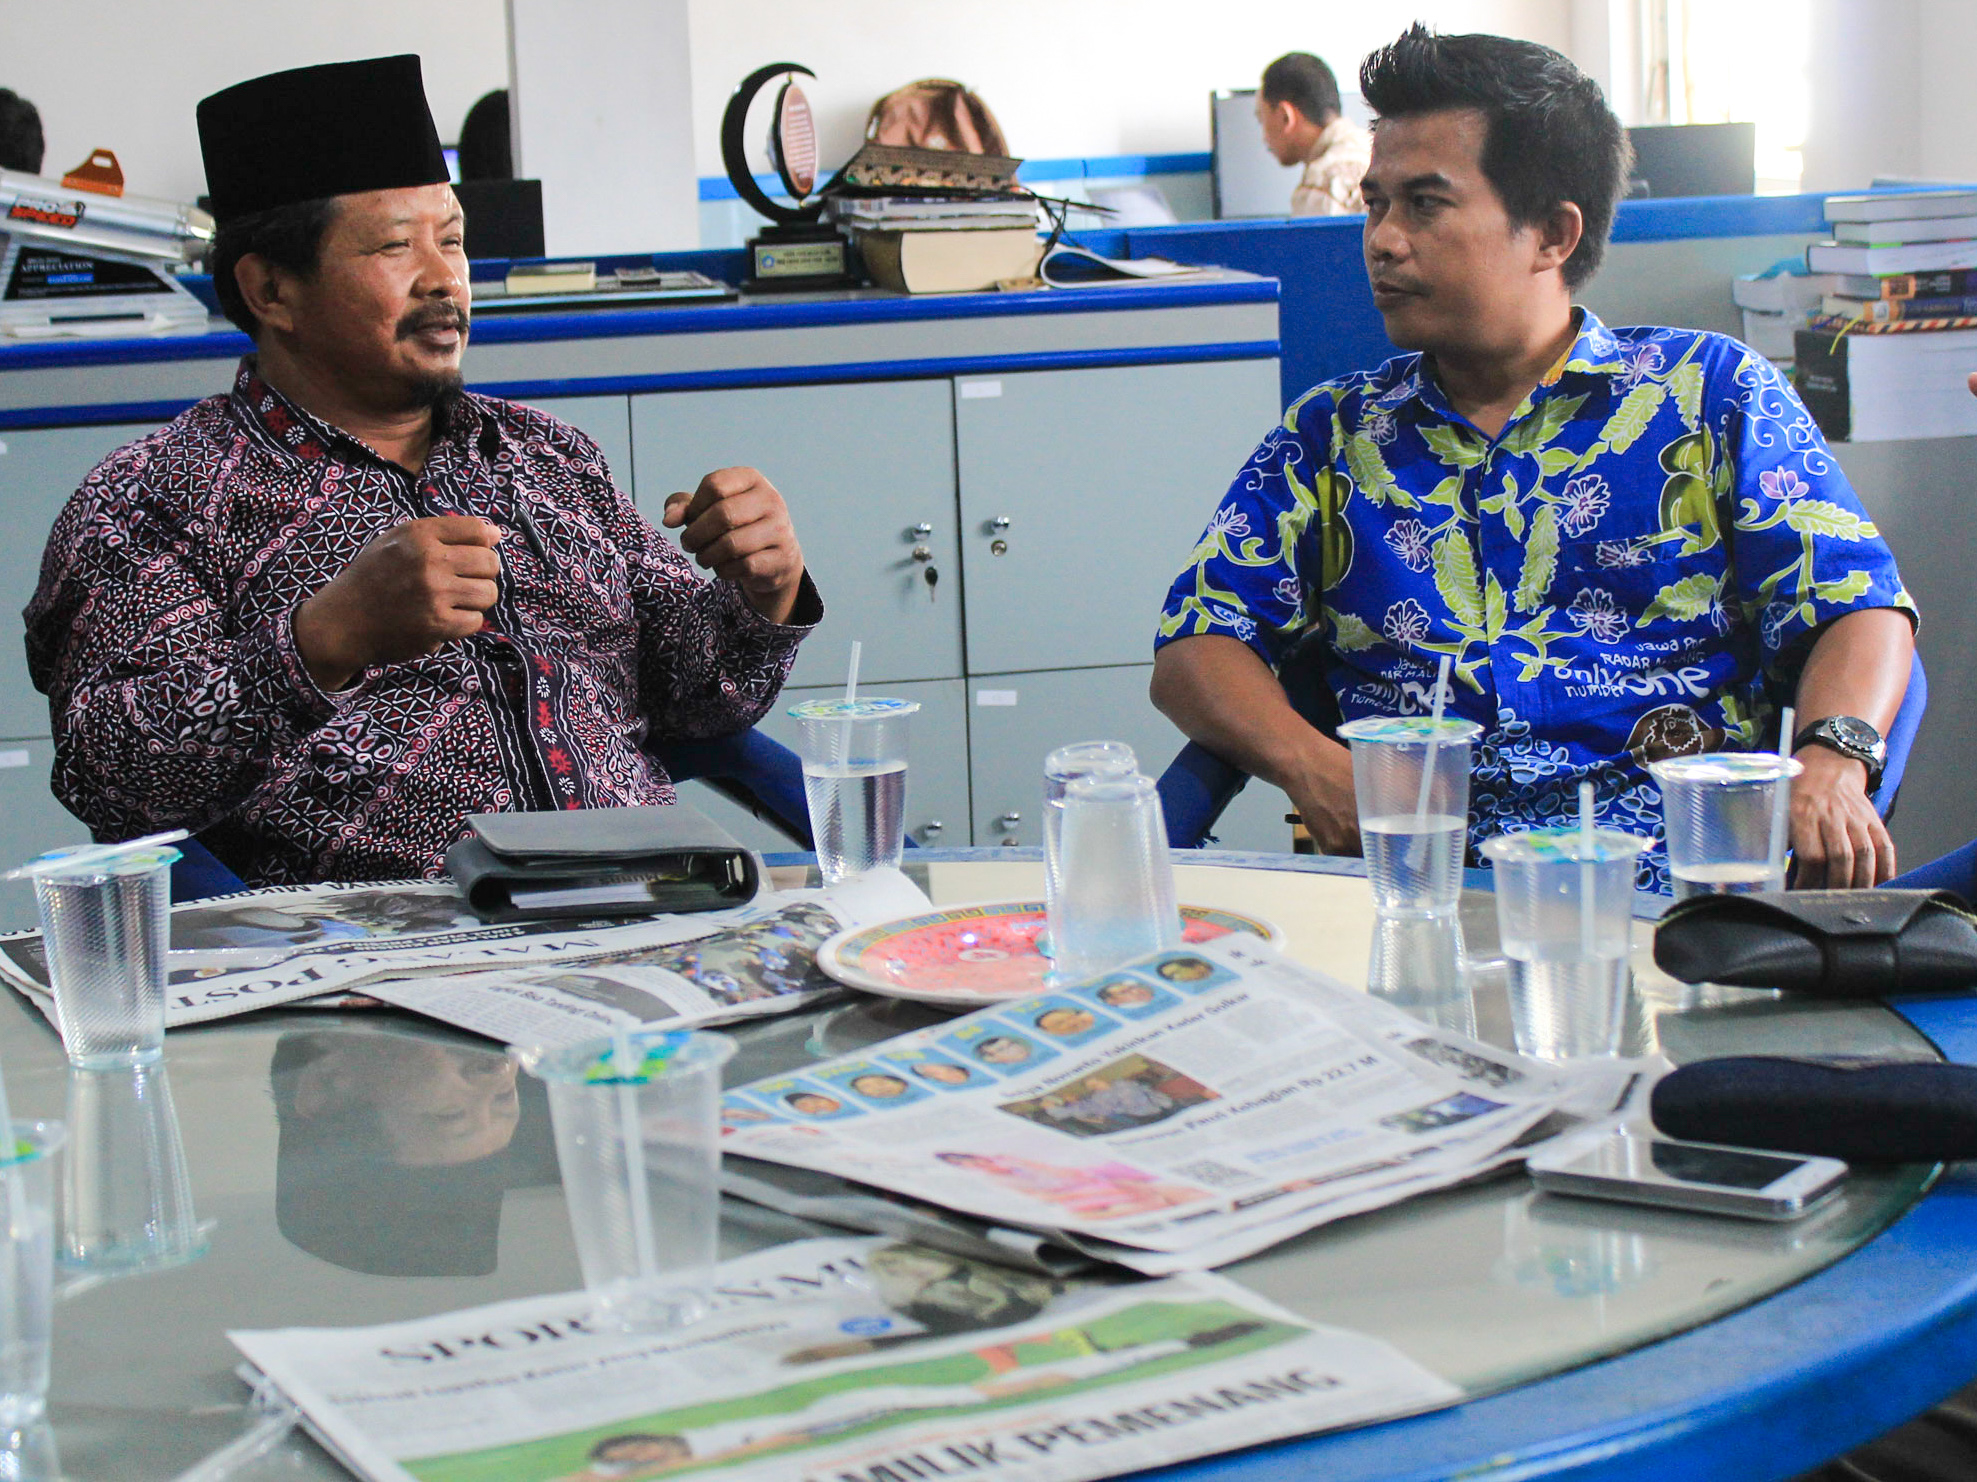 LDII Kab Malang ke RAdar Malang (4)